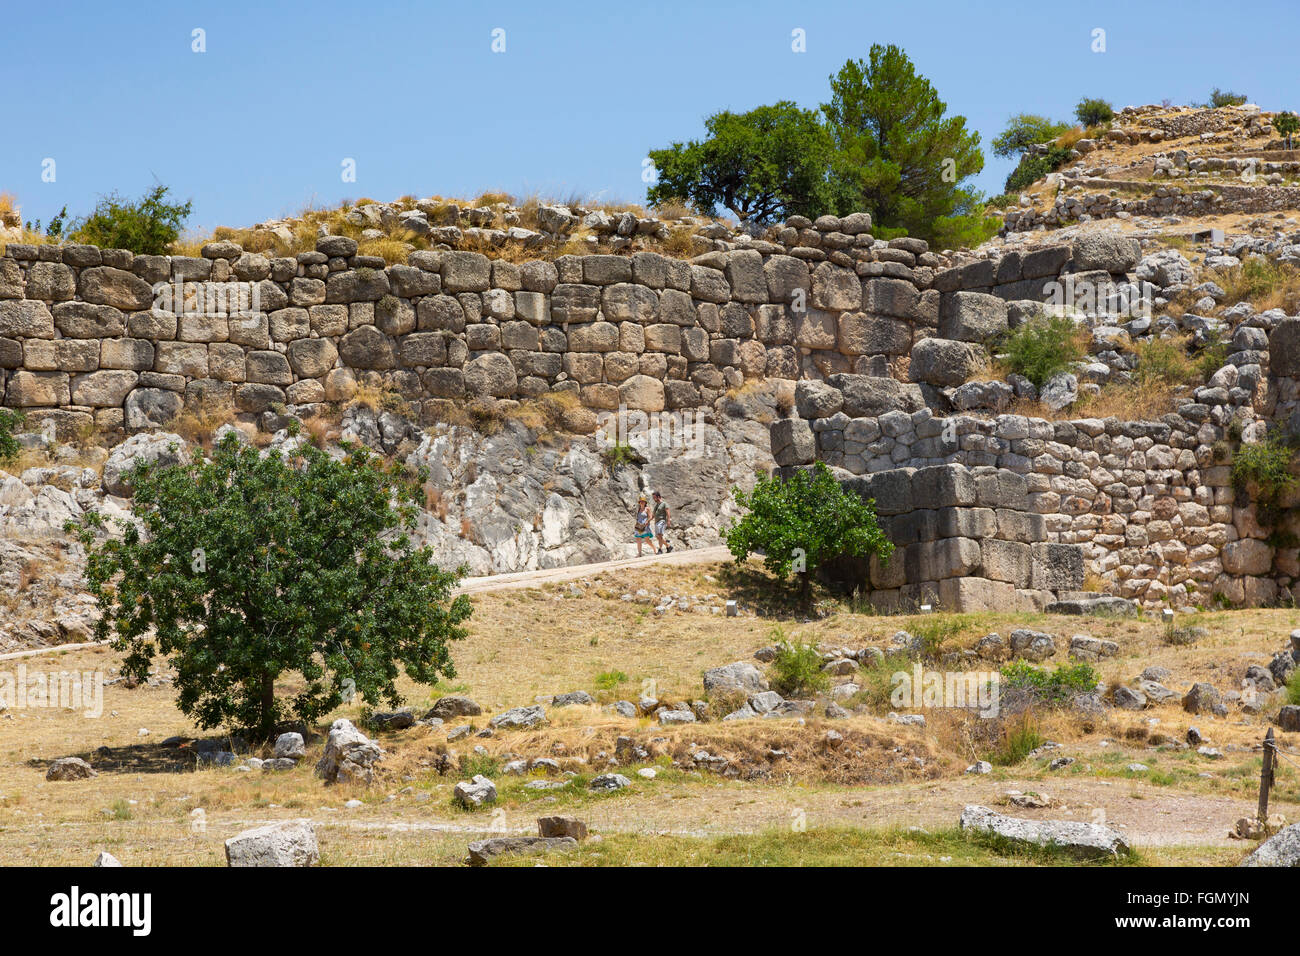 Mycenae, Argolis, Peloponnese, Greece.   The Cyclopean walls of the city's citadel. - Stock Image